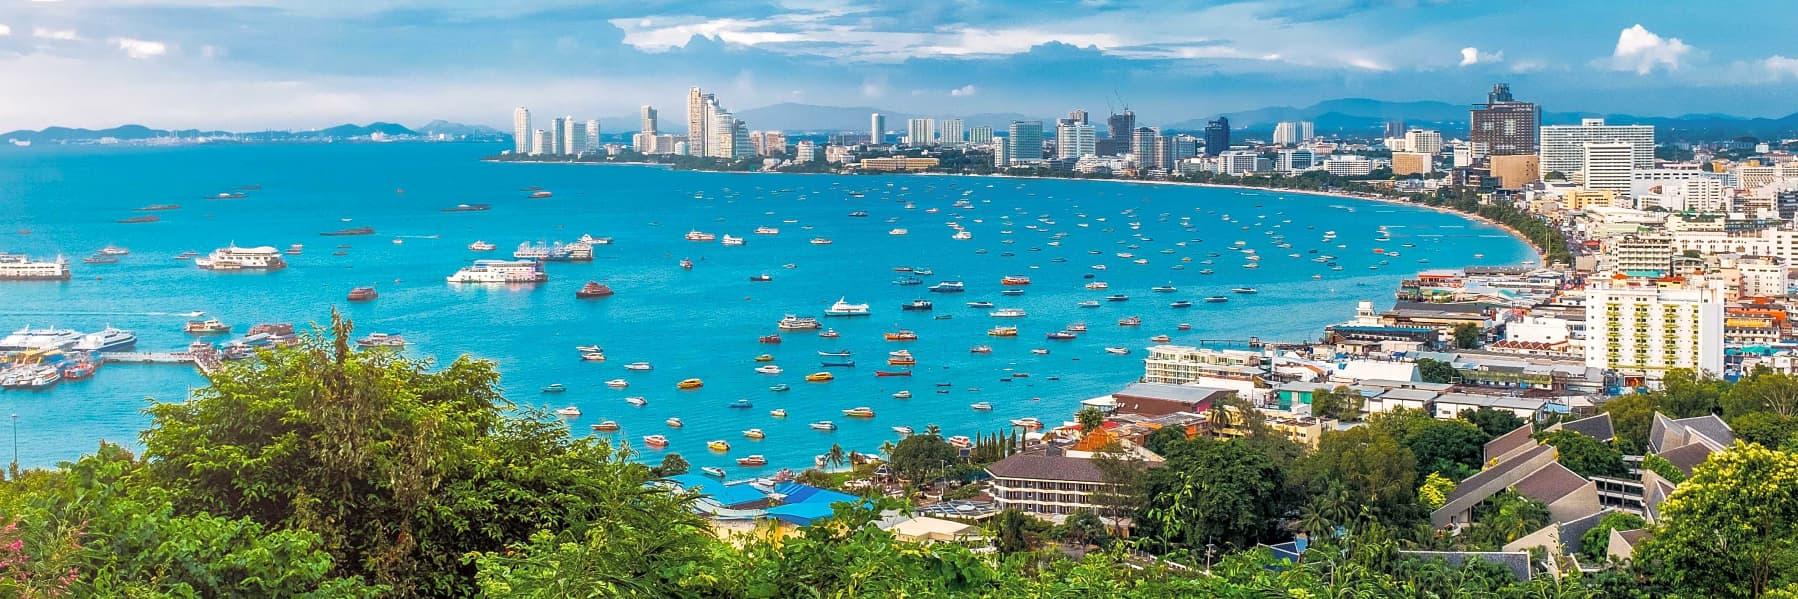 Pattaya Beach & Coral Island (Koh Larn) Small Group Tour from Bangkok – Full Day gallery